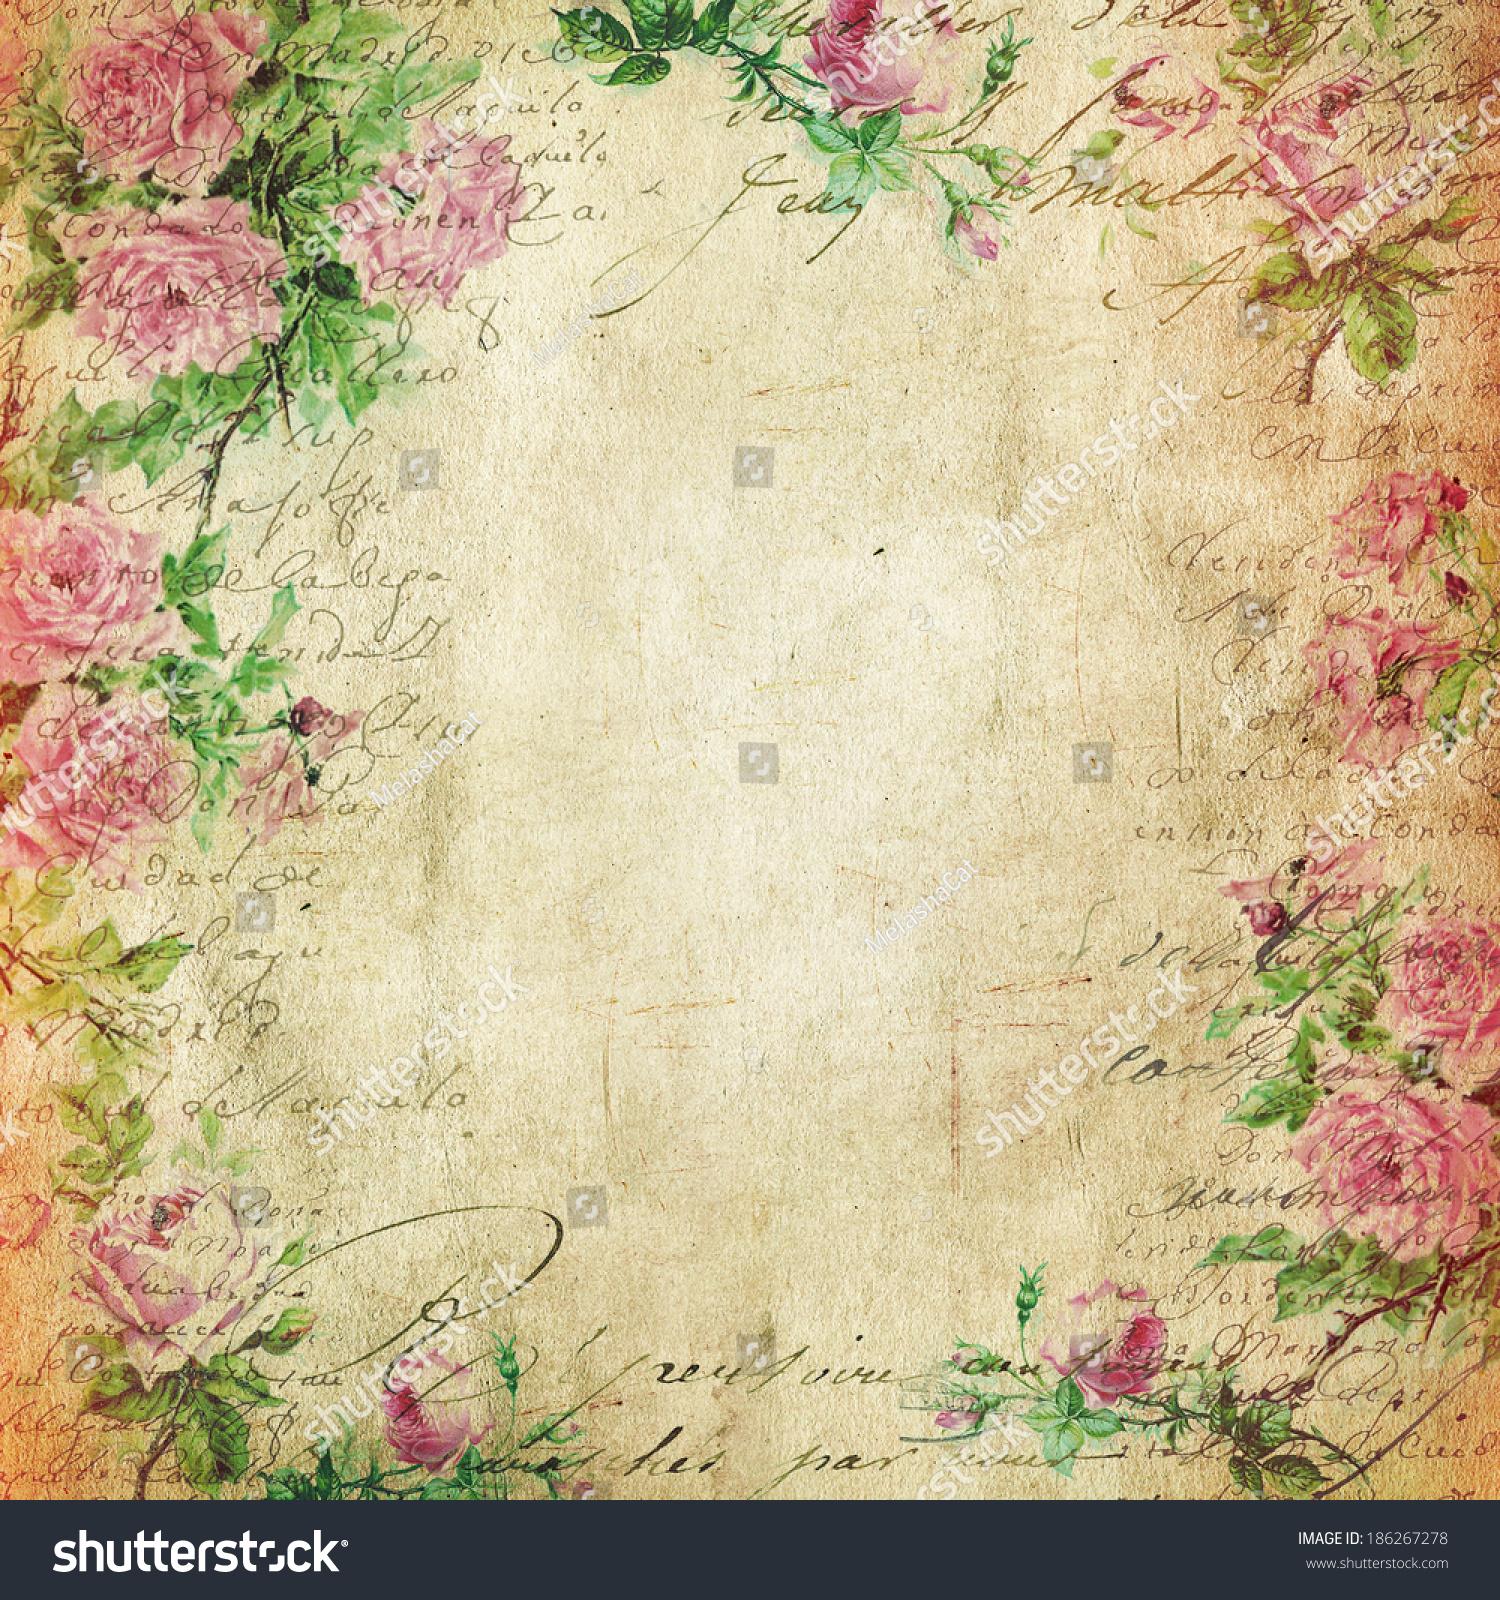 Vintage Background Flowers Paper 186267278